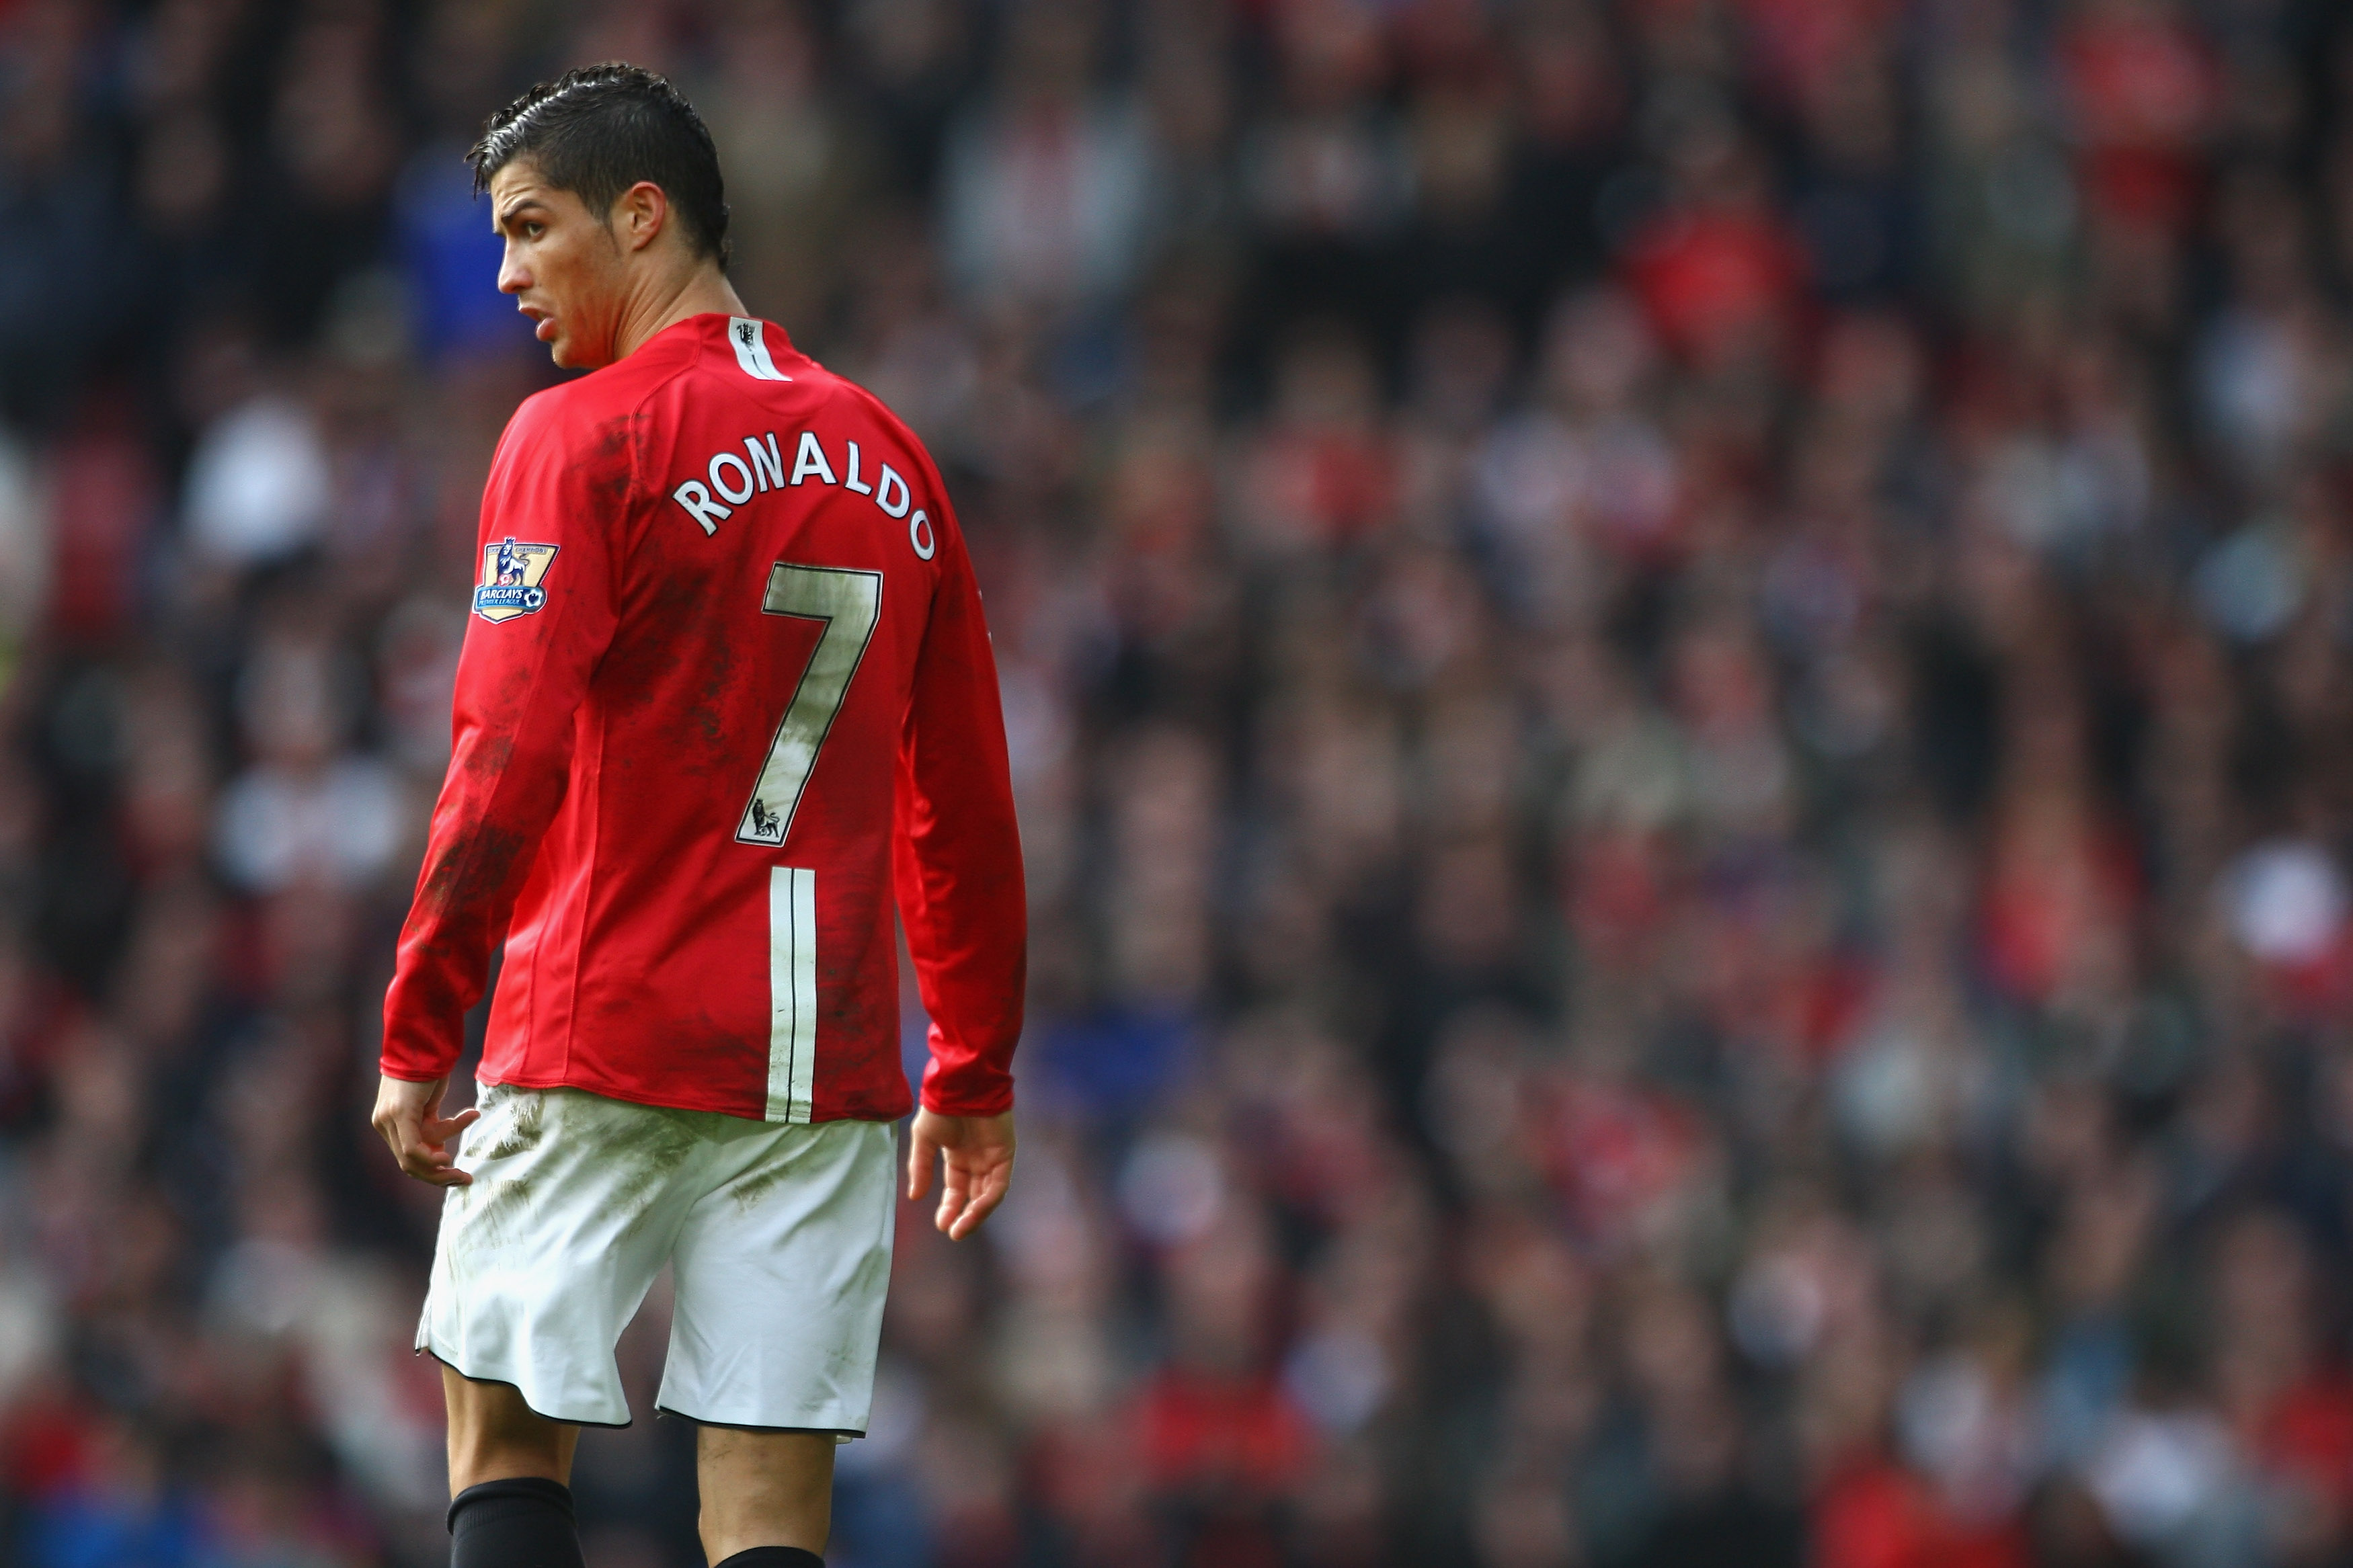 The Homecoming – Cristiano Ronaldo's return to Manchester United